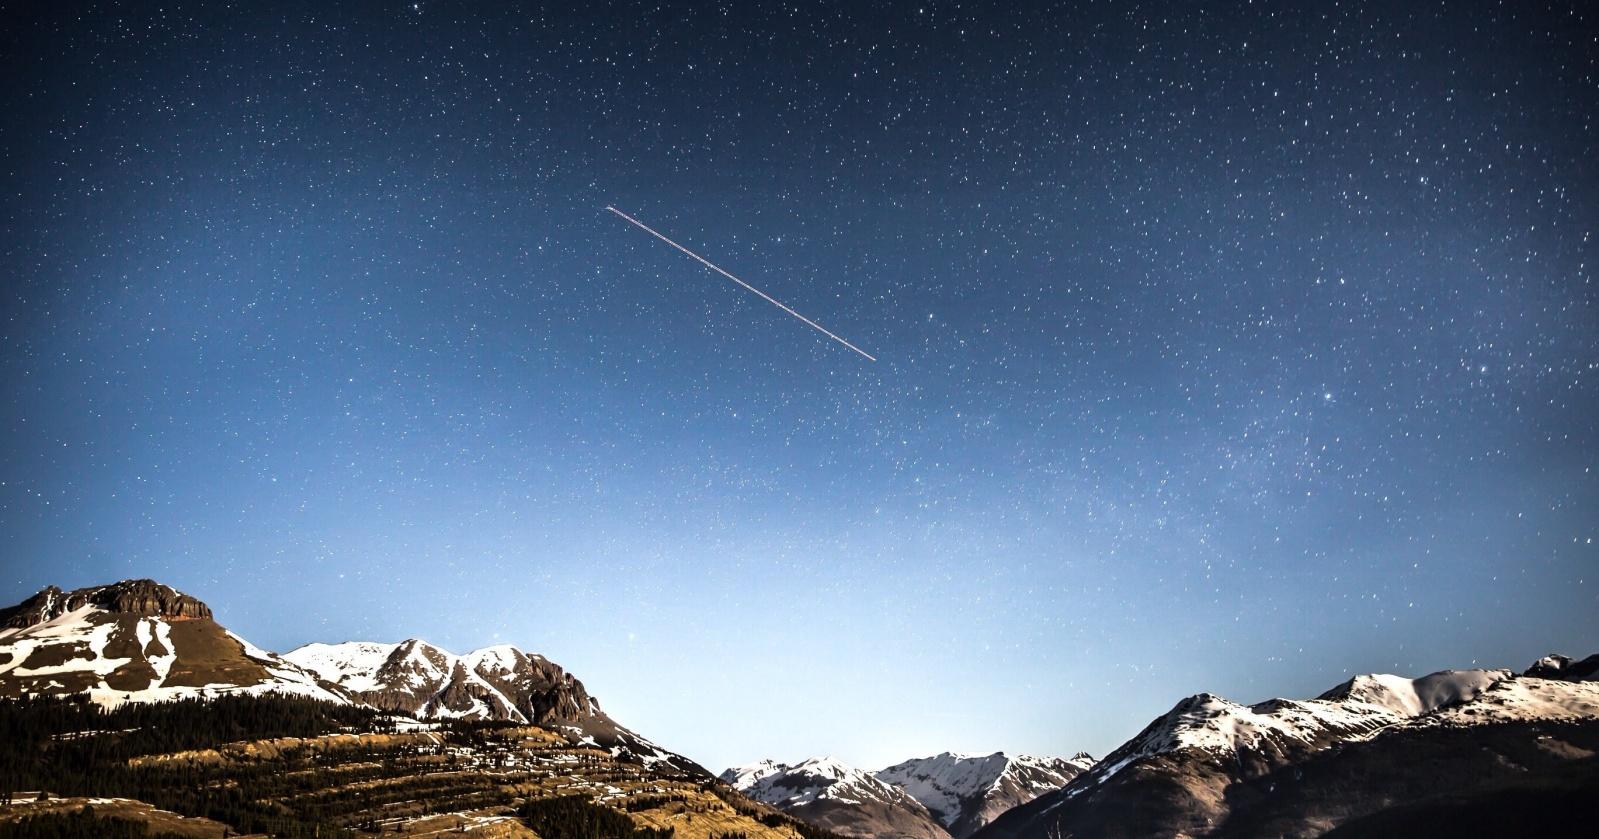 Доказано: жизнь на метеоритах возможна